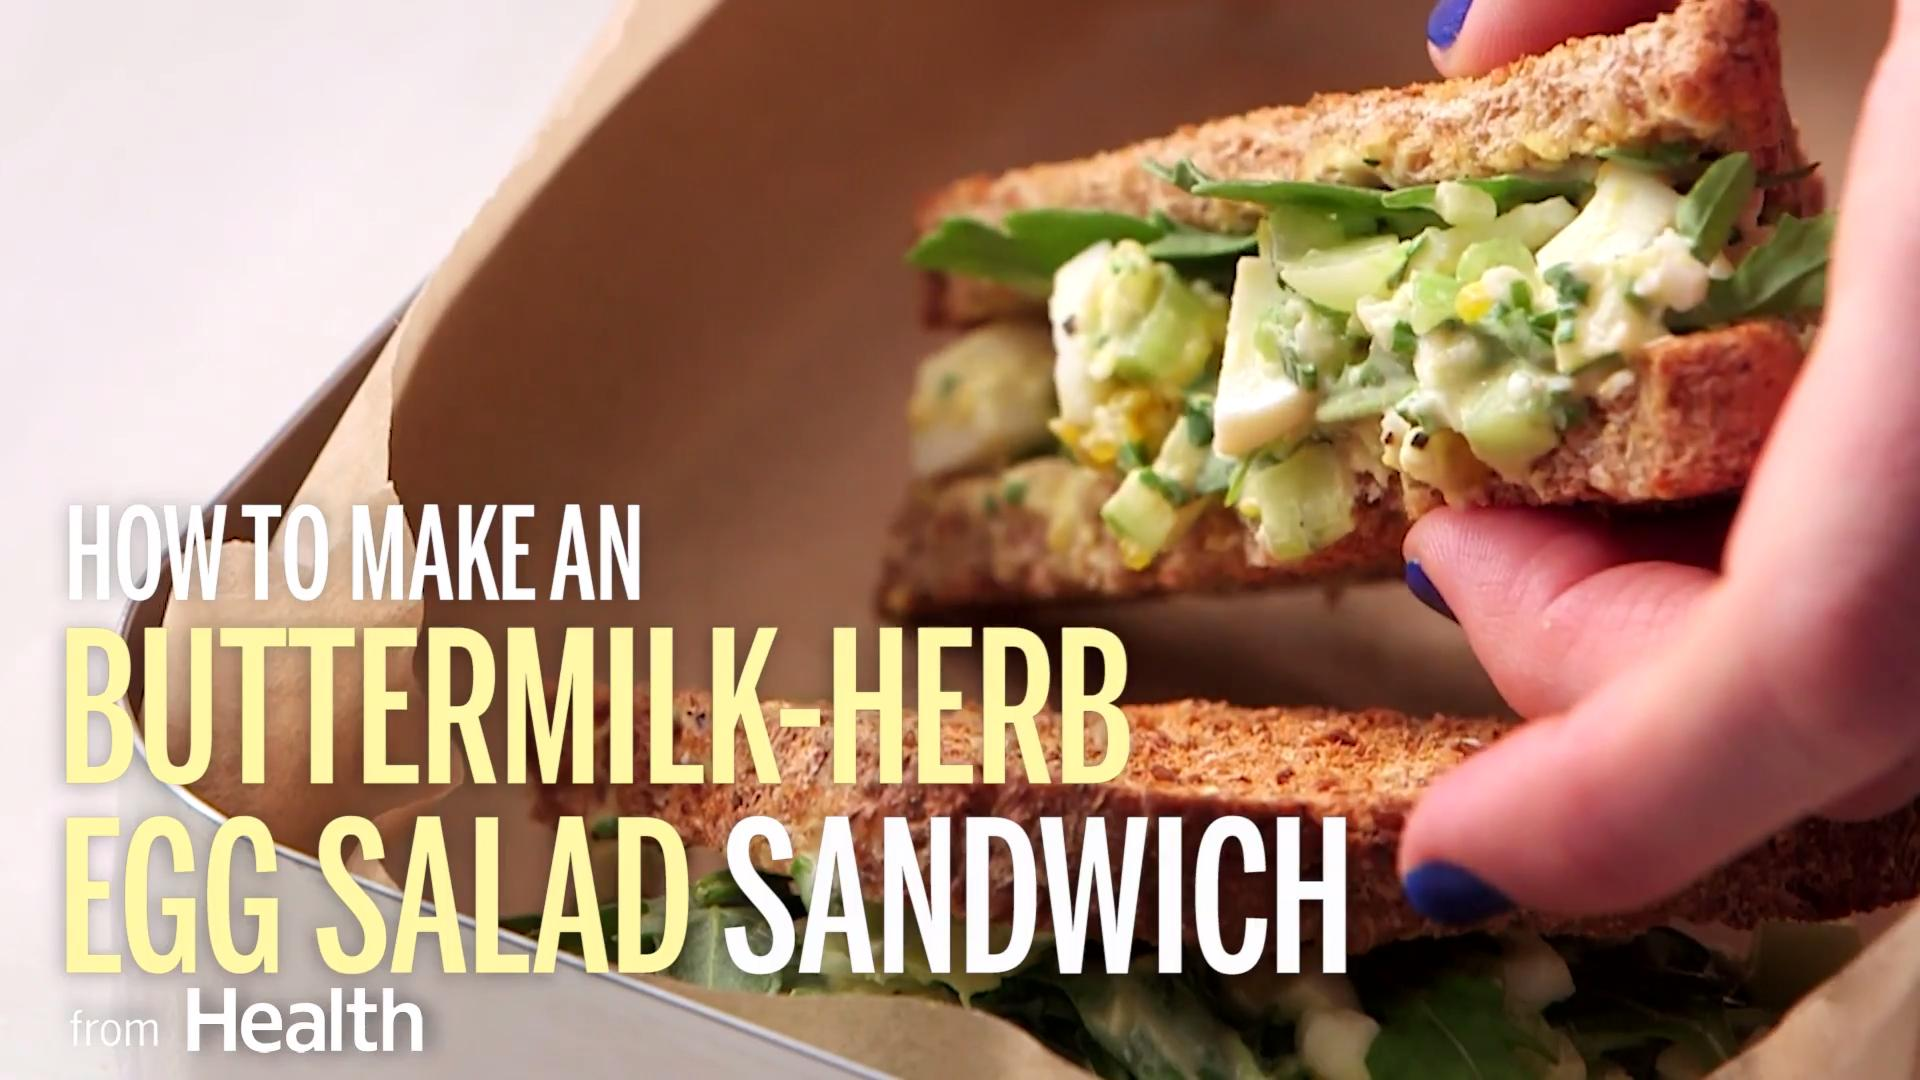 Buttermilk-Herb Egg Salad Sandwich